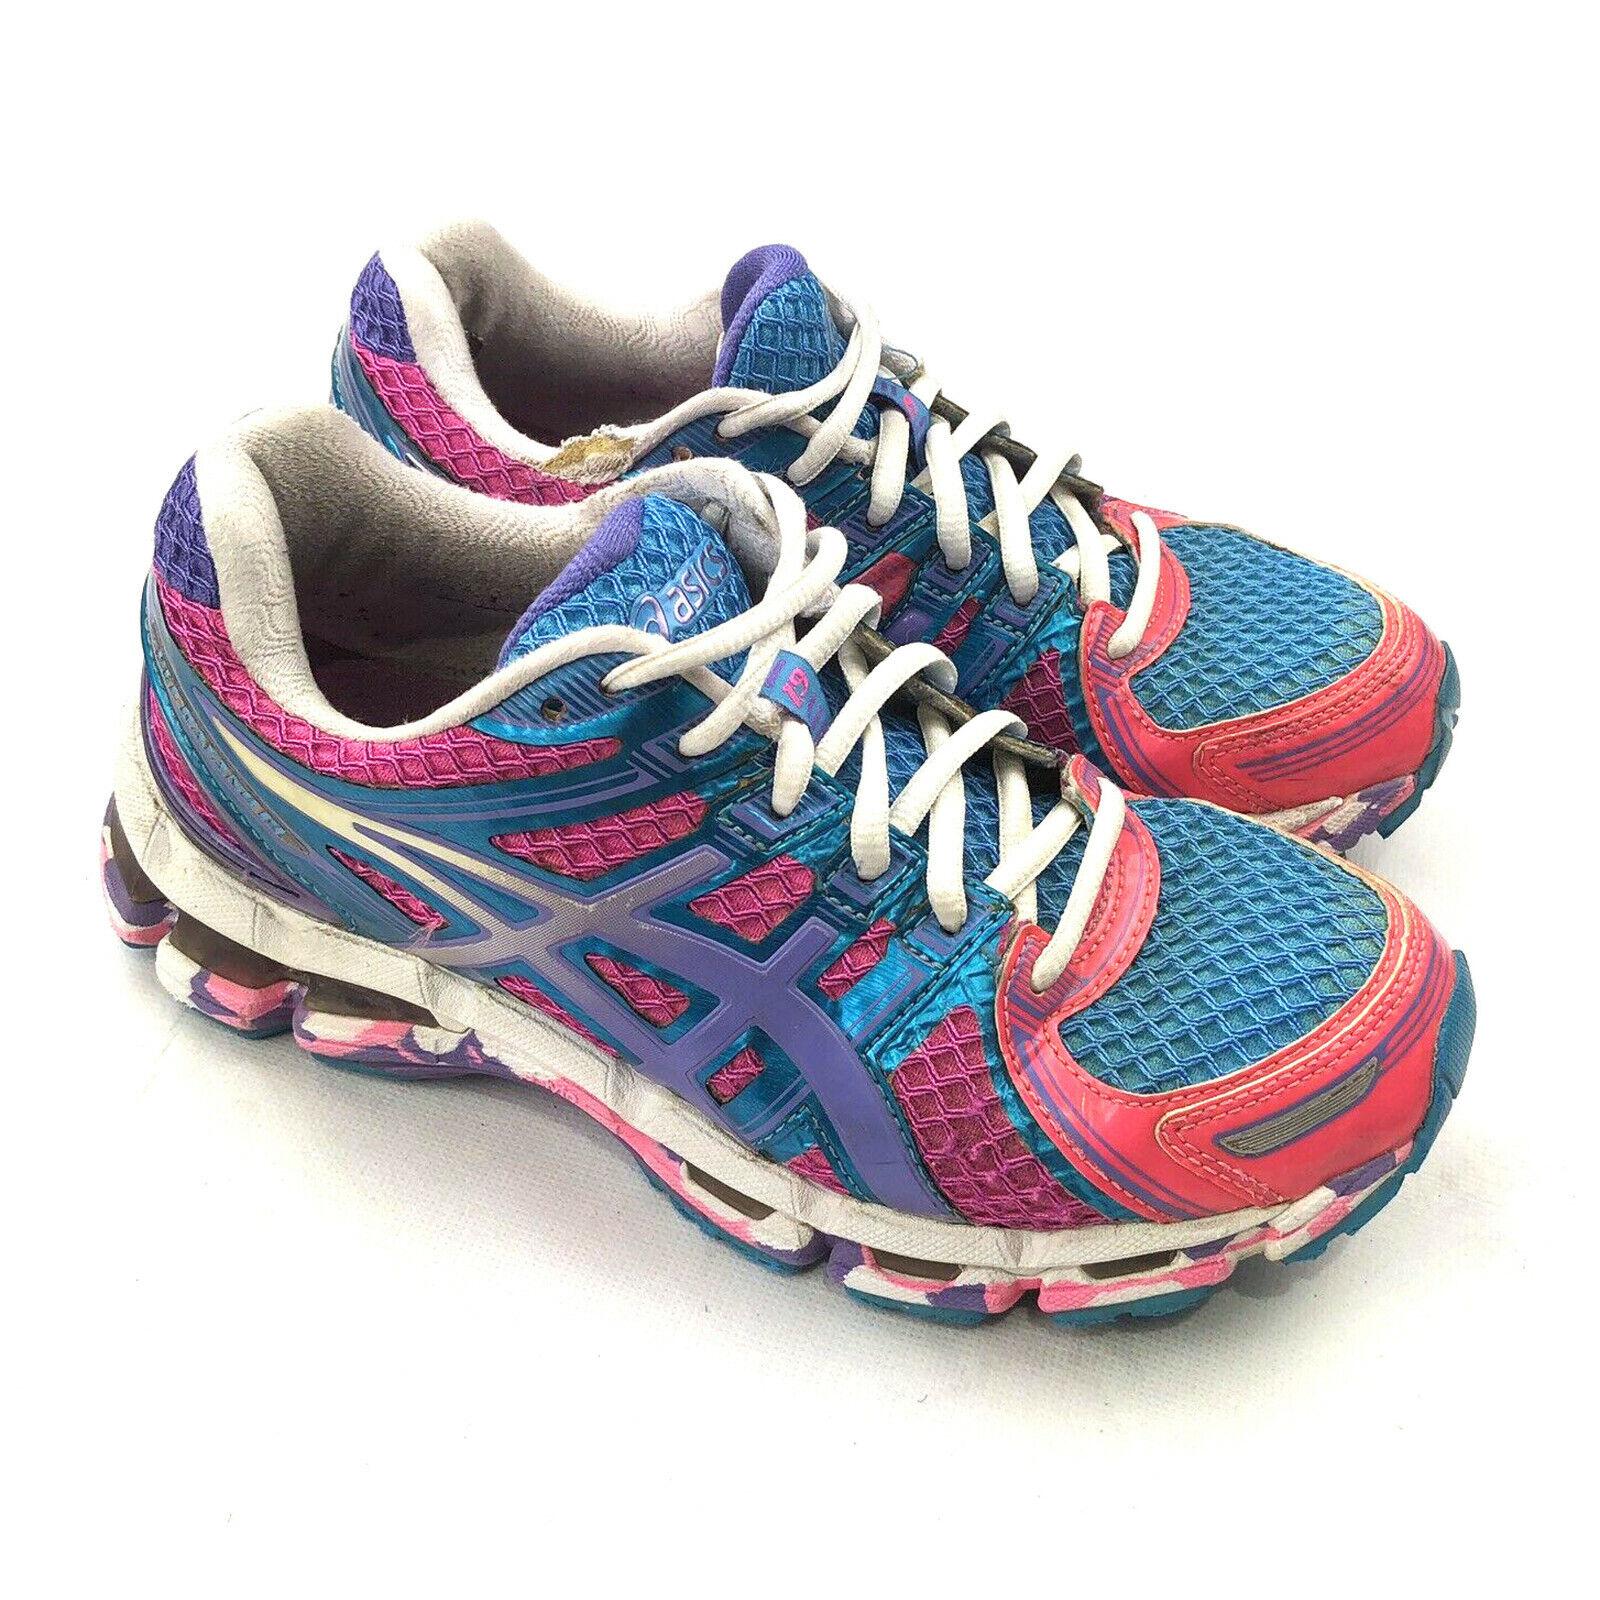 Asics Gel Kayano 19 Women's Athletic Running shoes Sneaker Pink Aqua T350Q sz 6